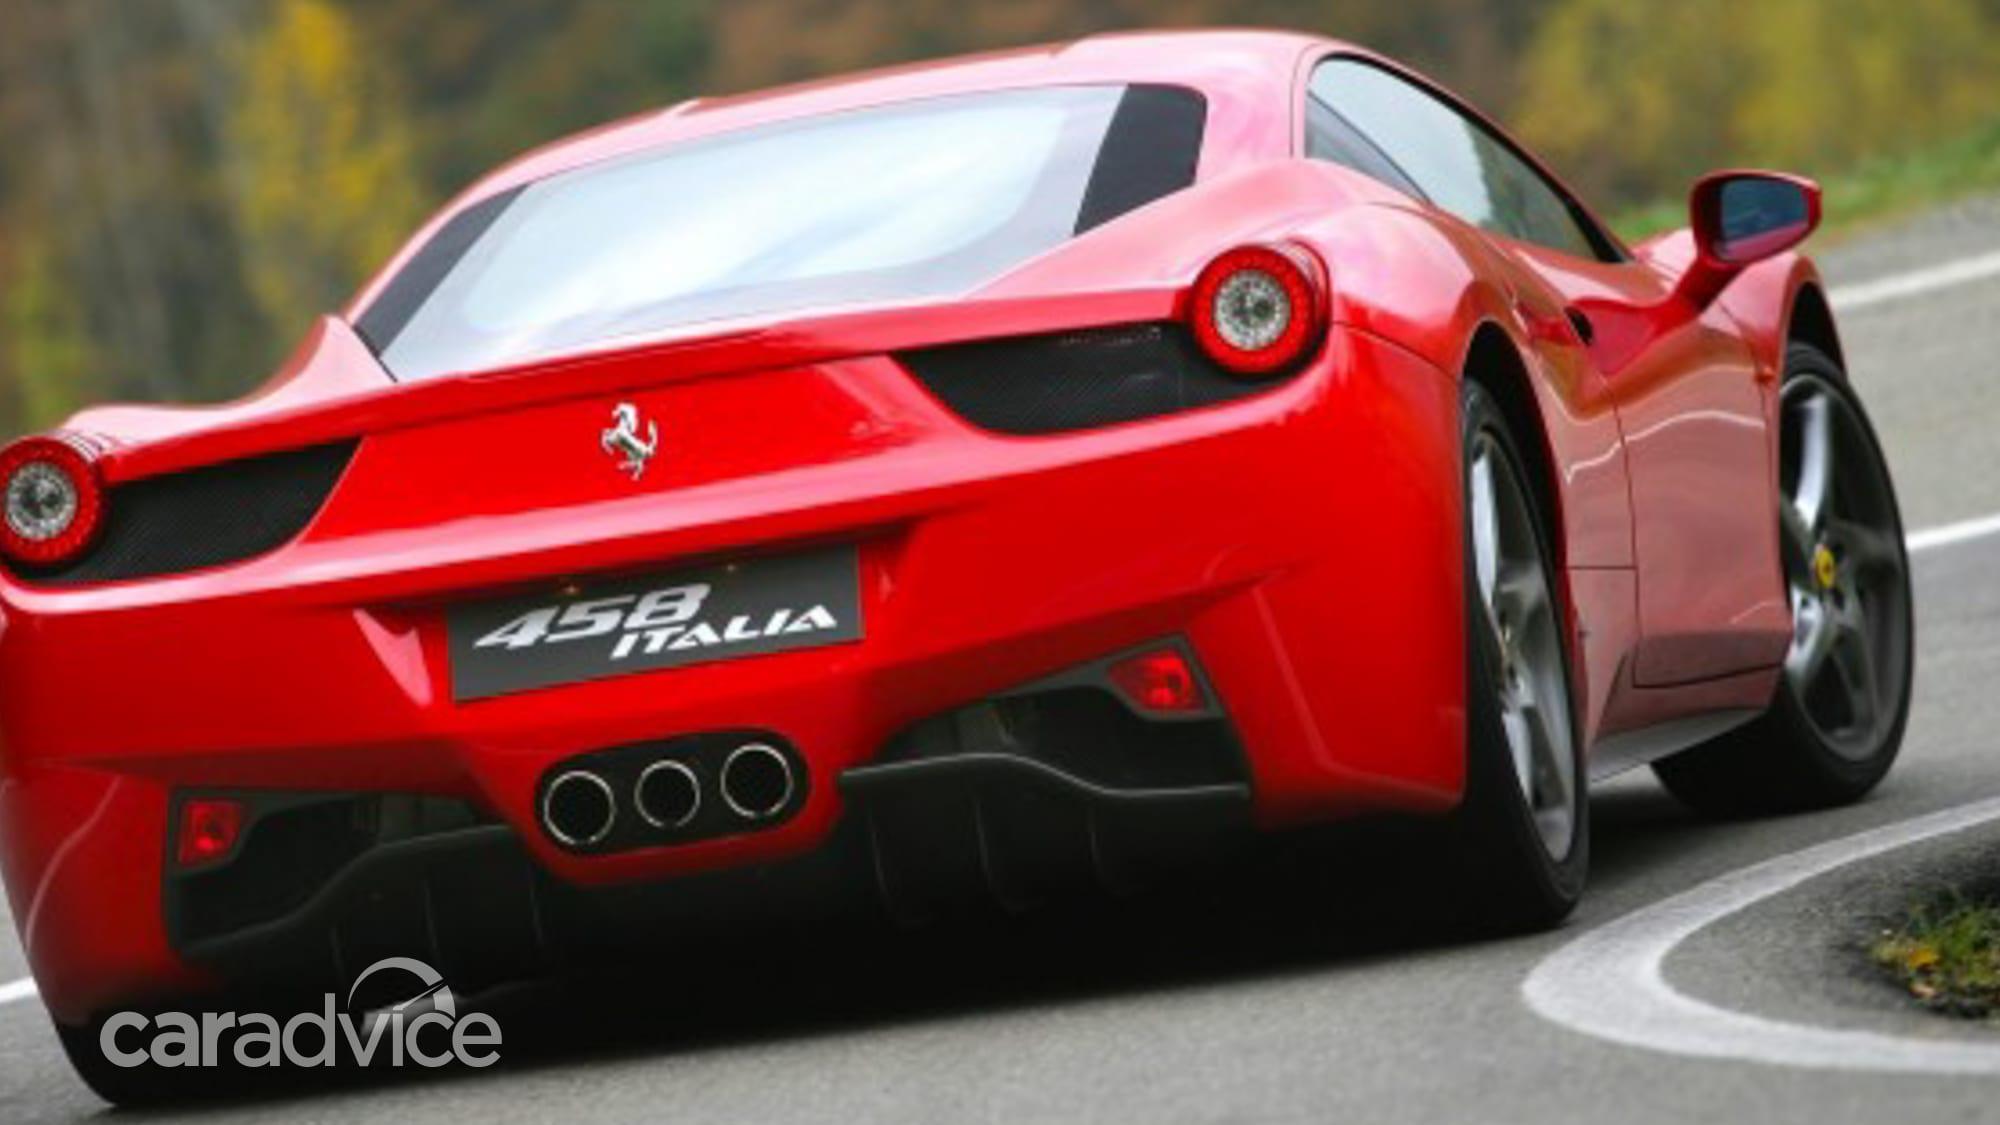 Ferrari recall numbers rise as Takata airbag fault expands ...